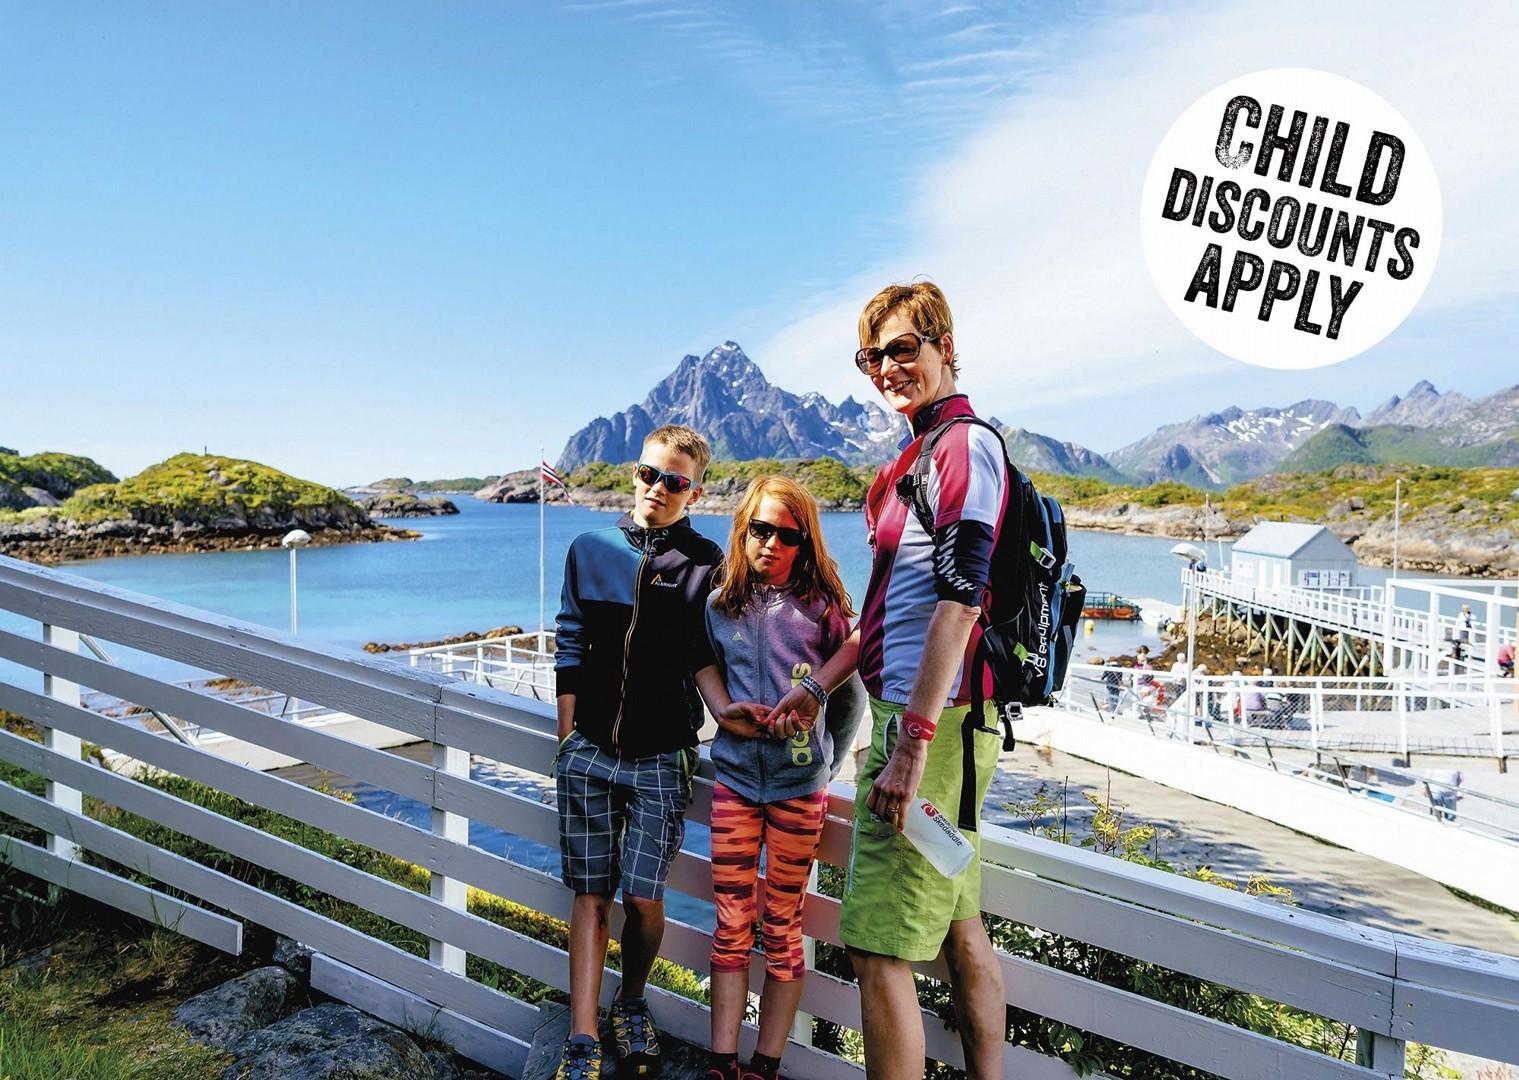 Lofoten Islands.jpg - Norway - Lofoten Islands - Biking with Vikings - Self-Guided Family Cycling Holiday - Family Cycling